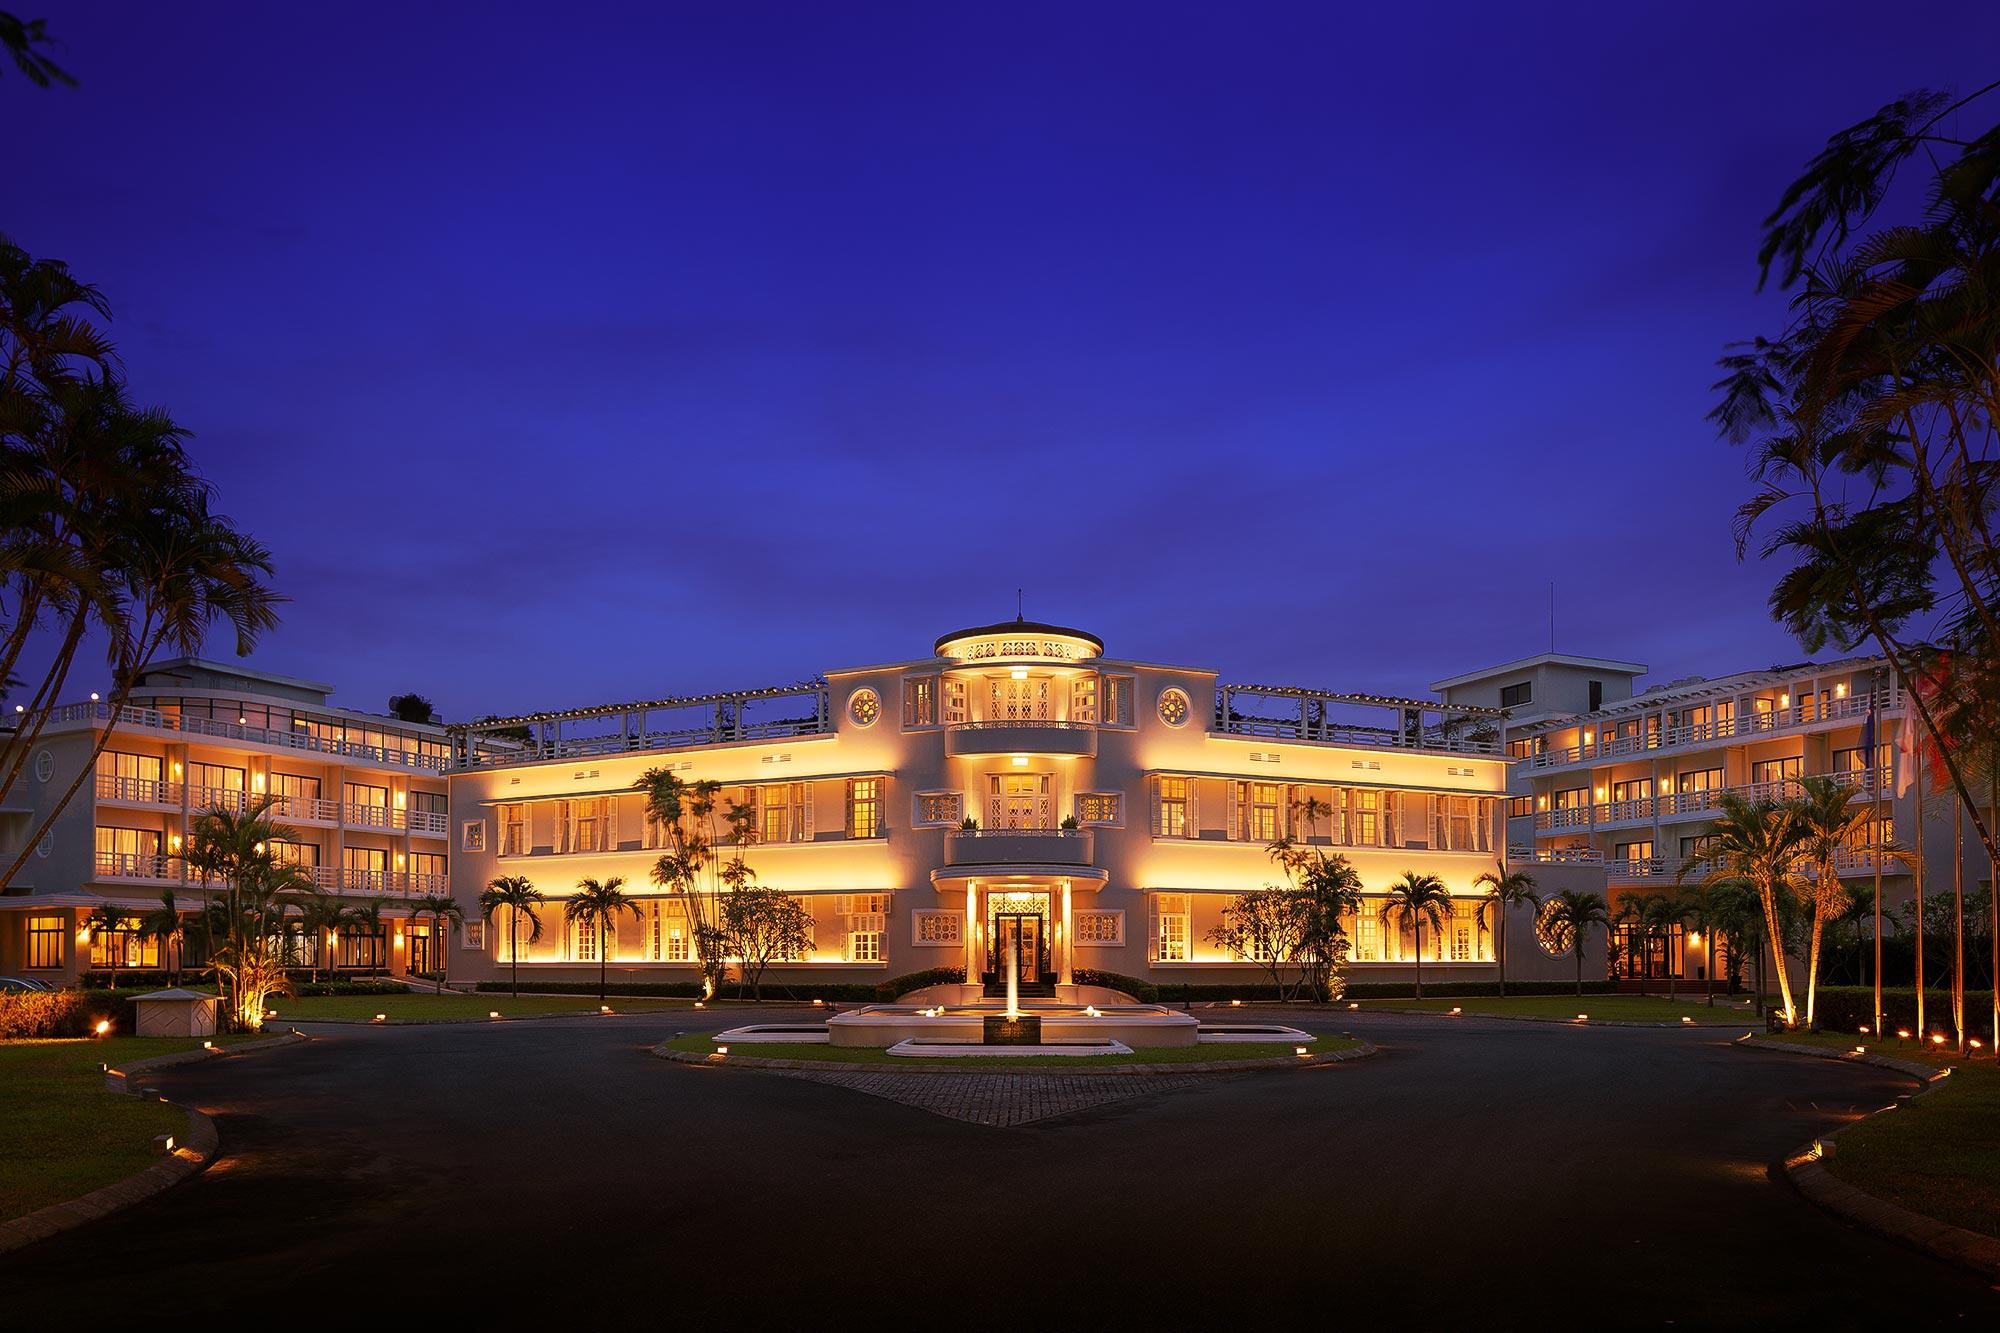 Azerai-Exterior-Luxury-Hotel-Photographer-Adrian-Kilchherr-Asia-Europe-Vietnam